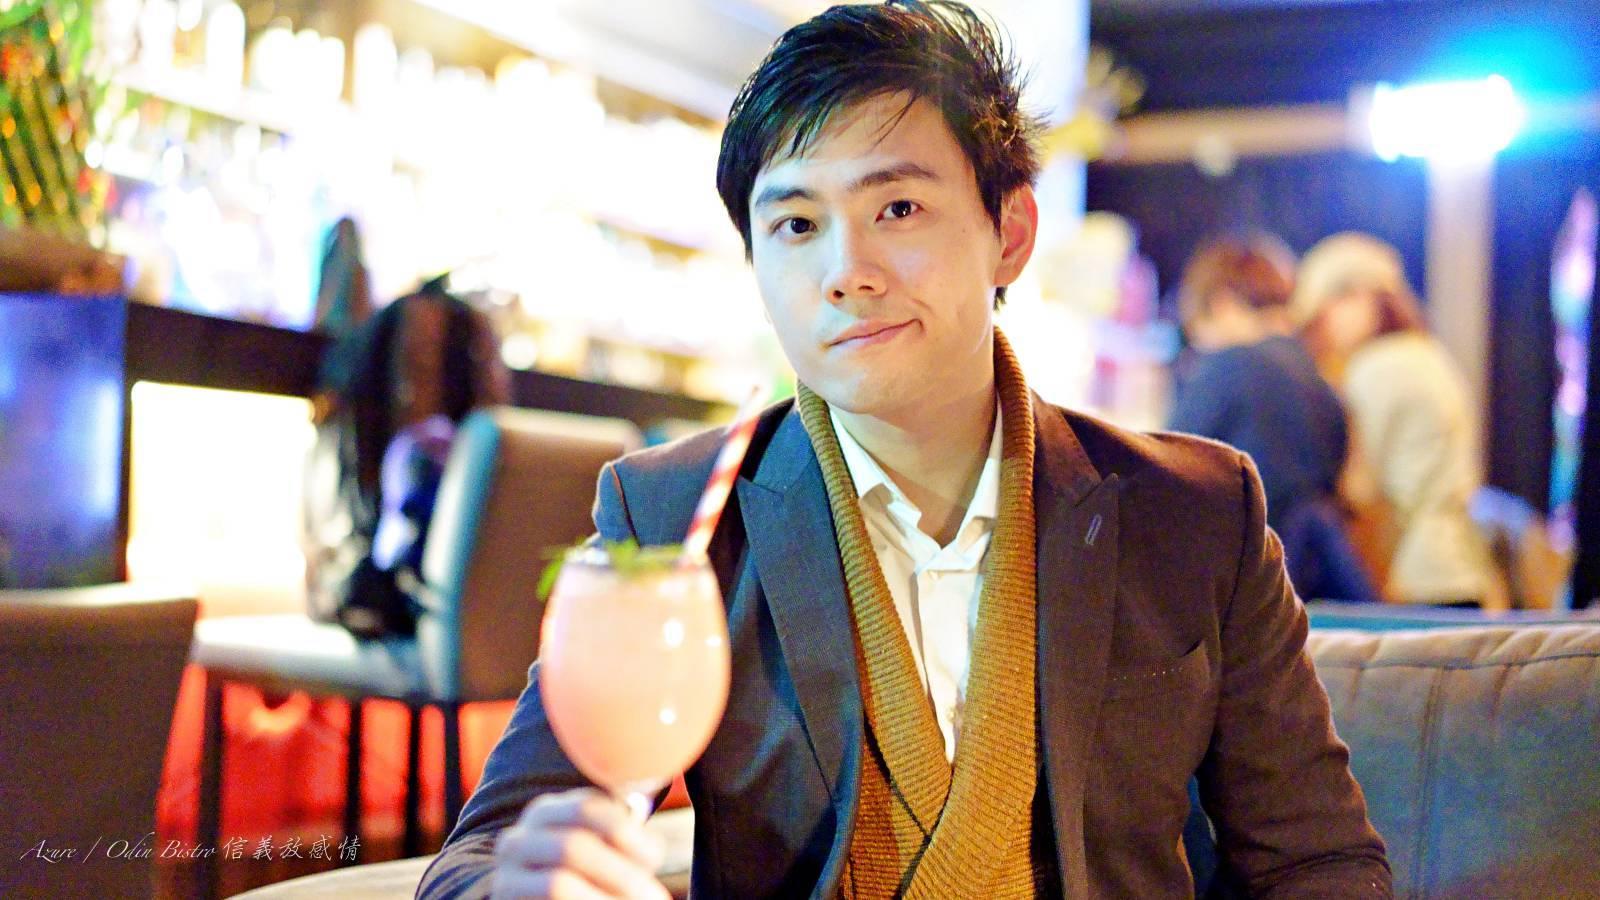 Azure 許政淳 信義放感情,信義區世貿101站餐酒館,創意調酒,真網美冰茶